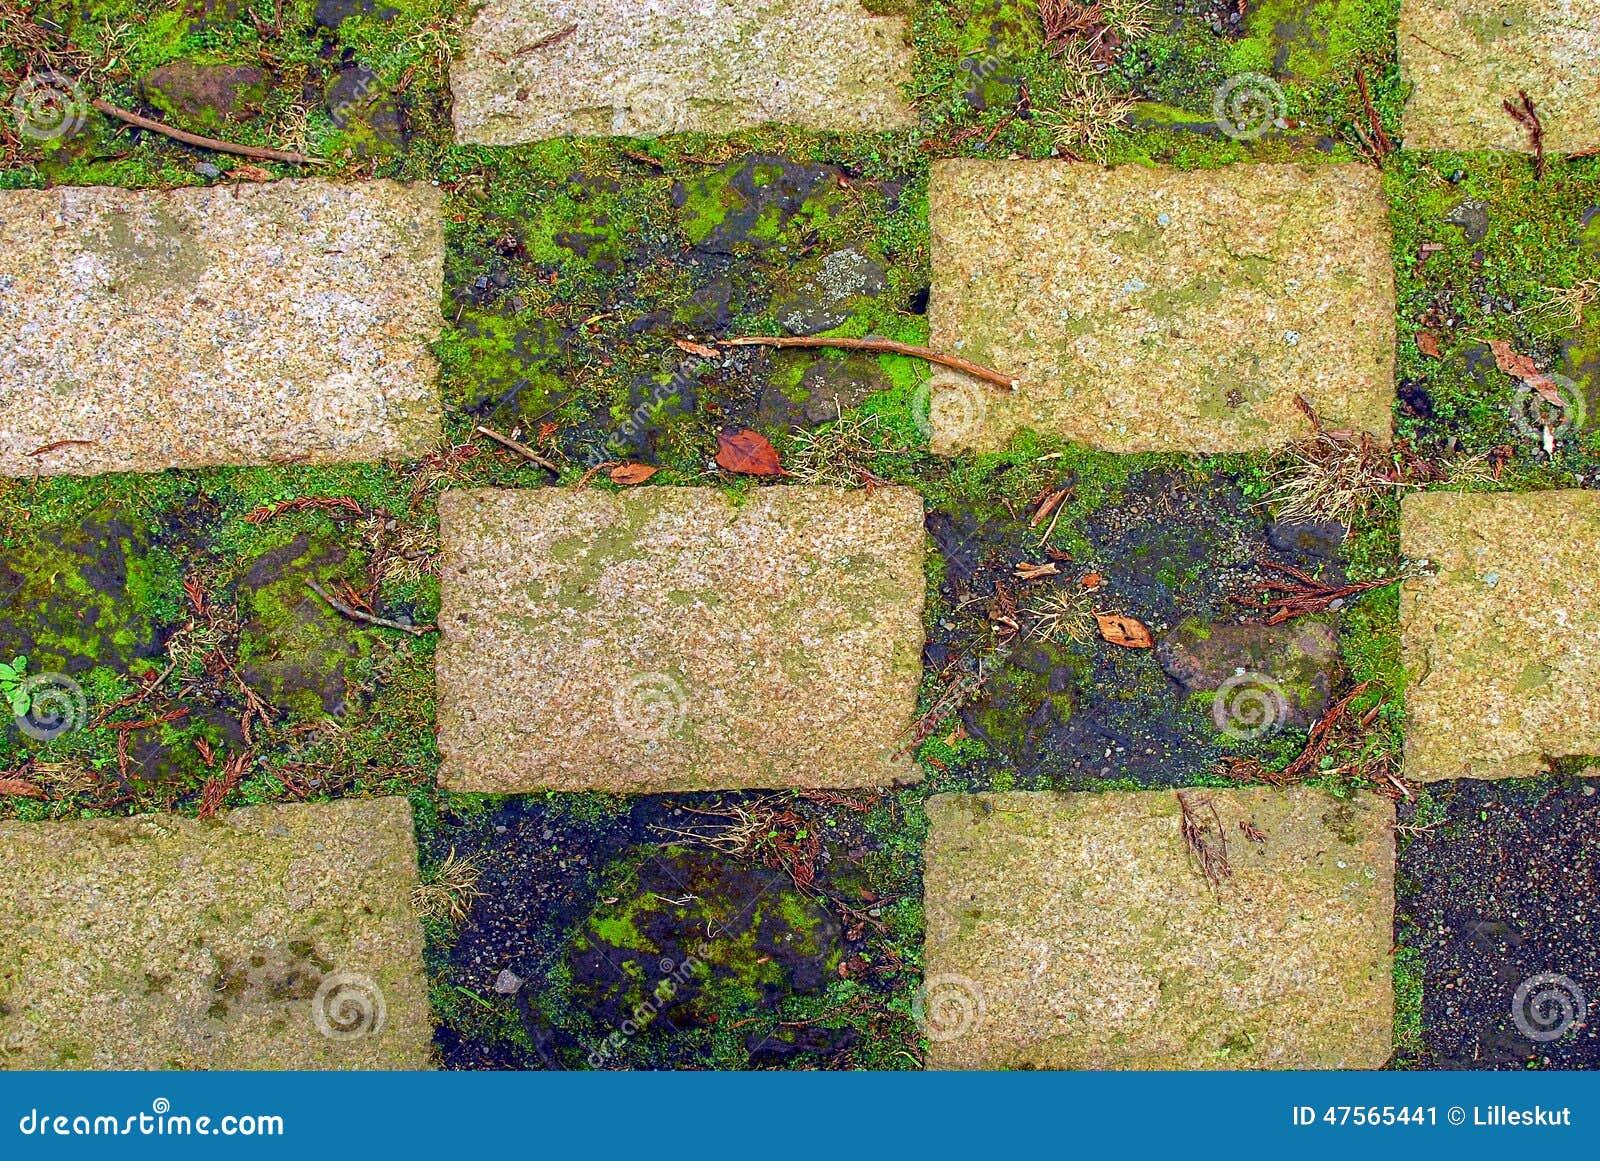 Grass checkerboard stock photo image 47565441 for Checkerboard garden designs